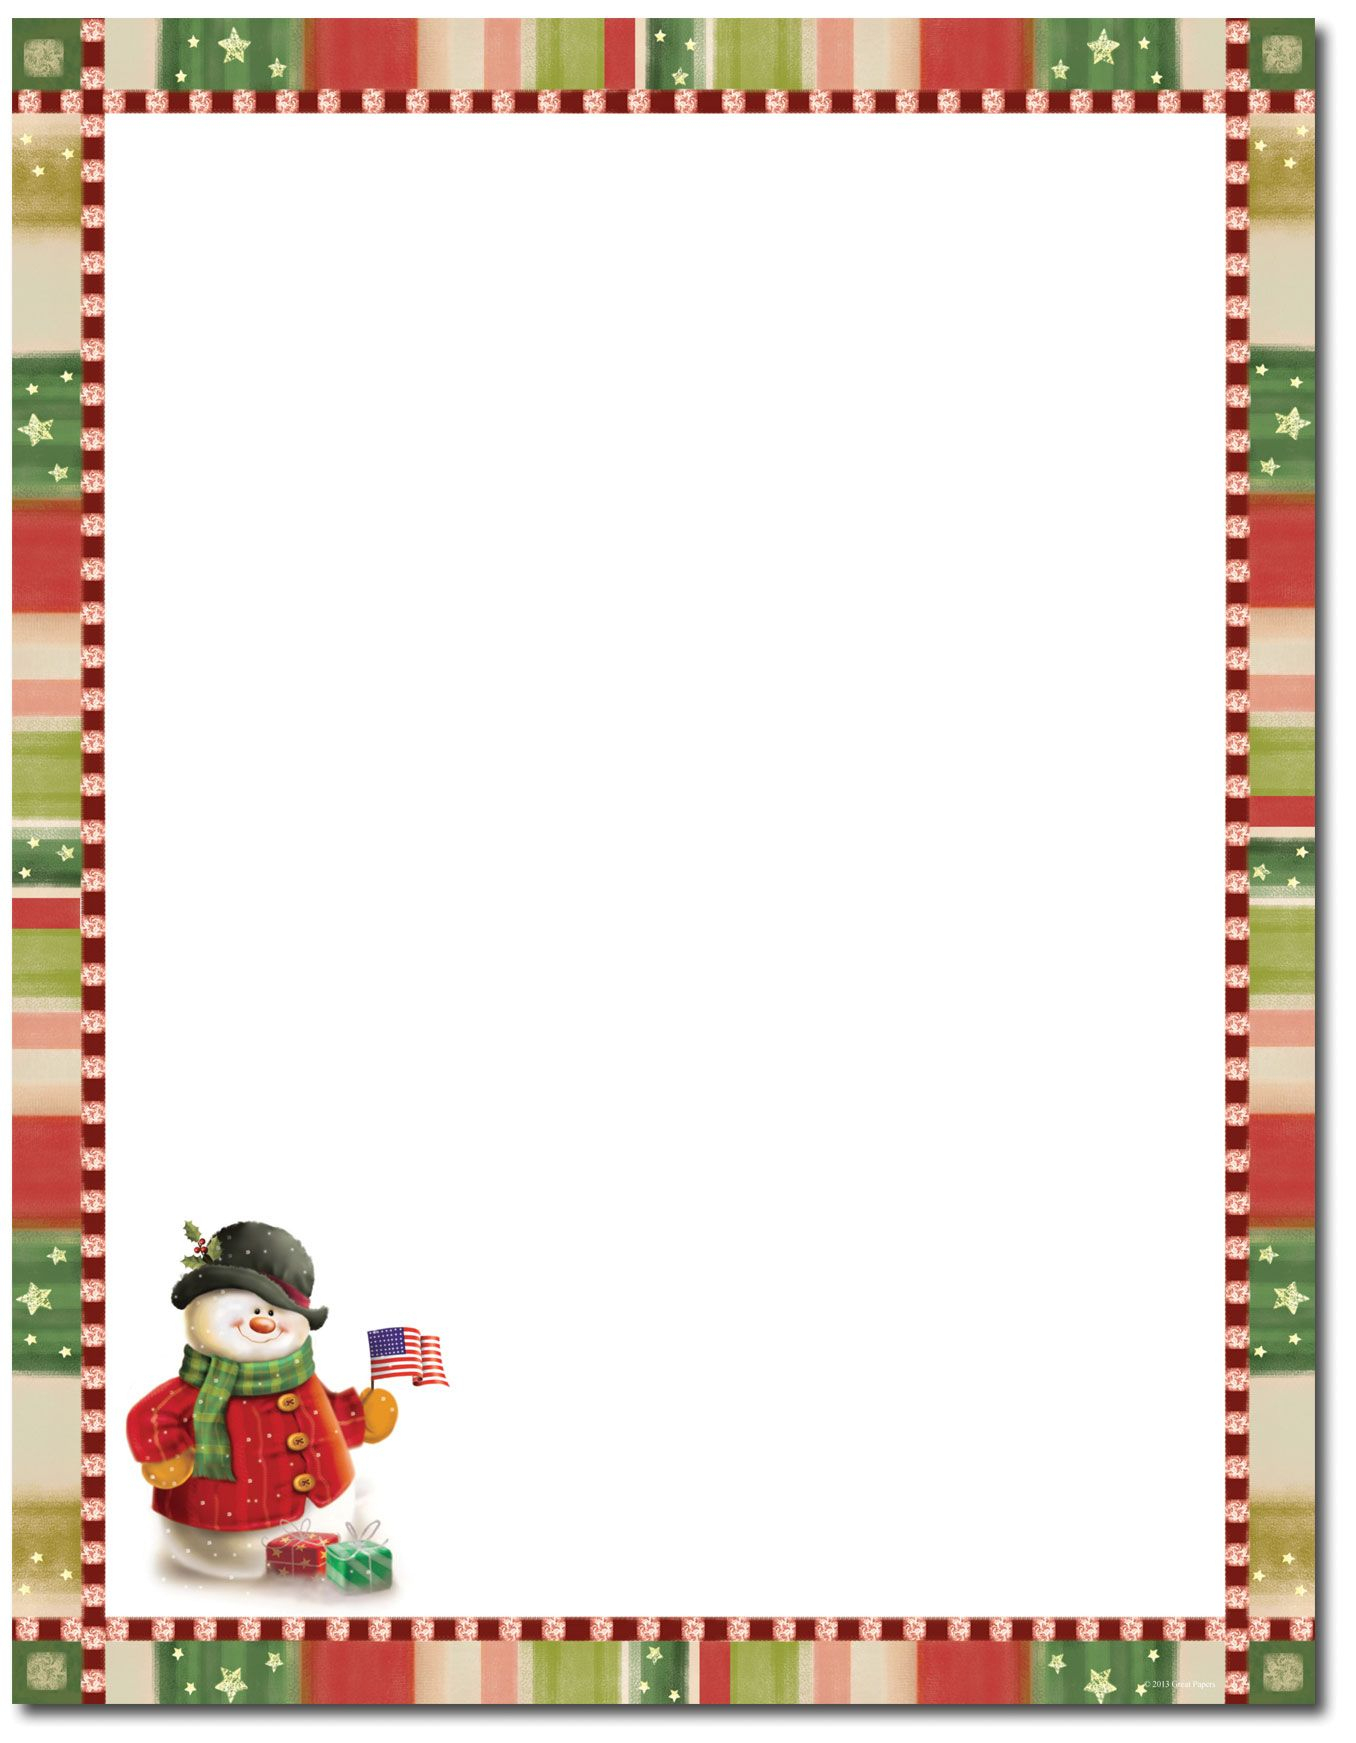 Patriotic Snowman Letterhead   Christmas Stationery   Christmas - Free Printable Snowman Stationery